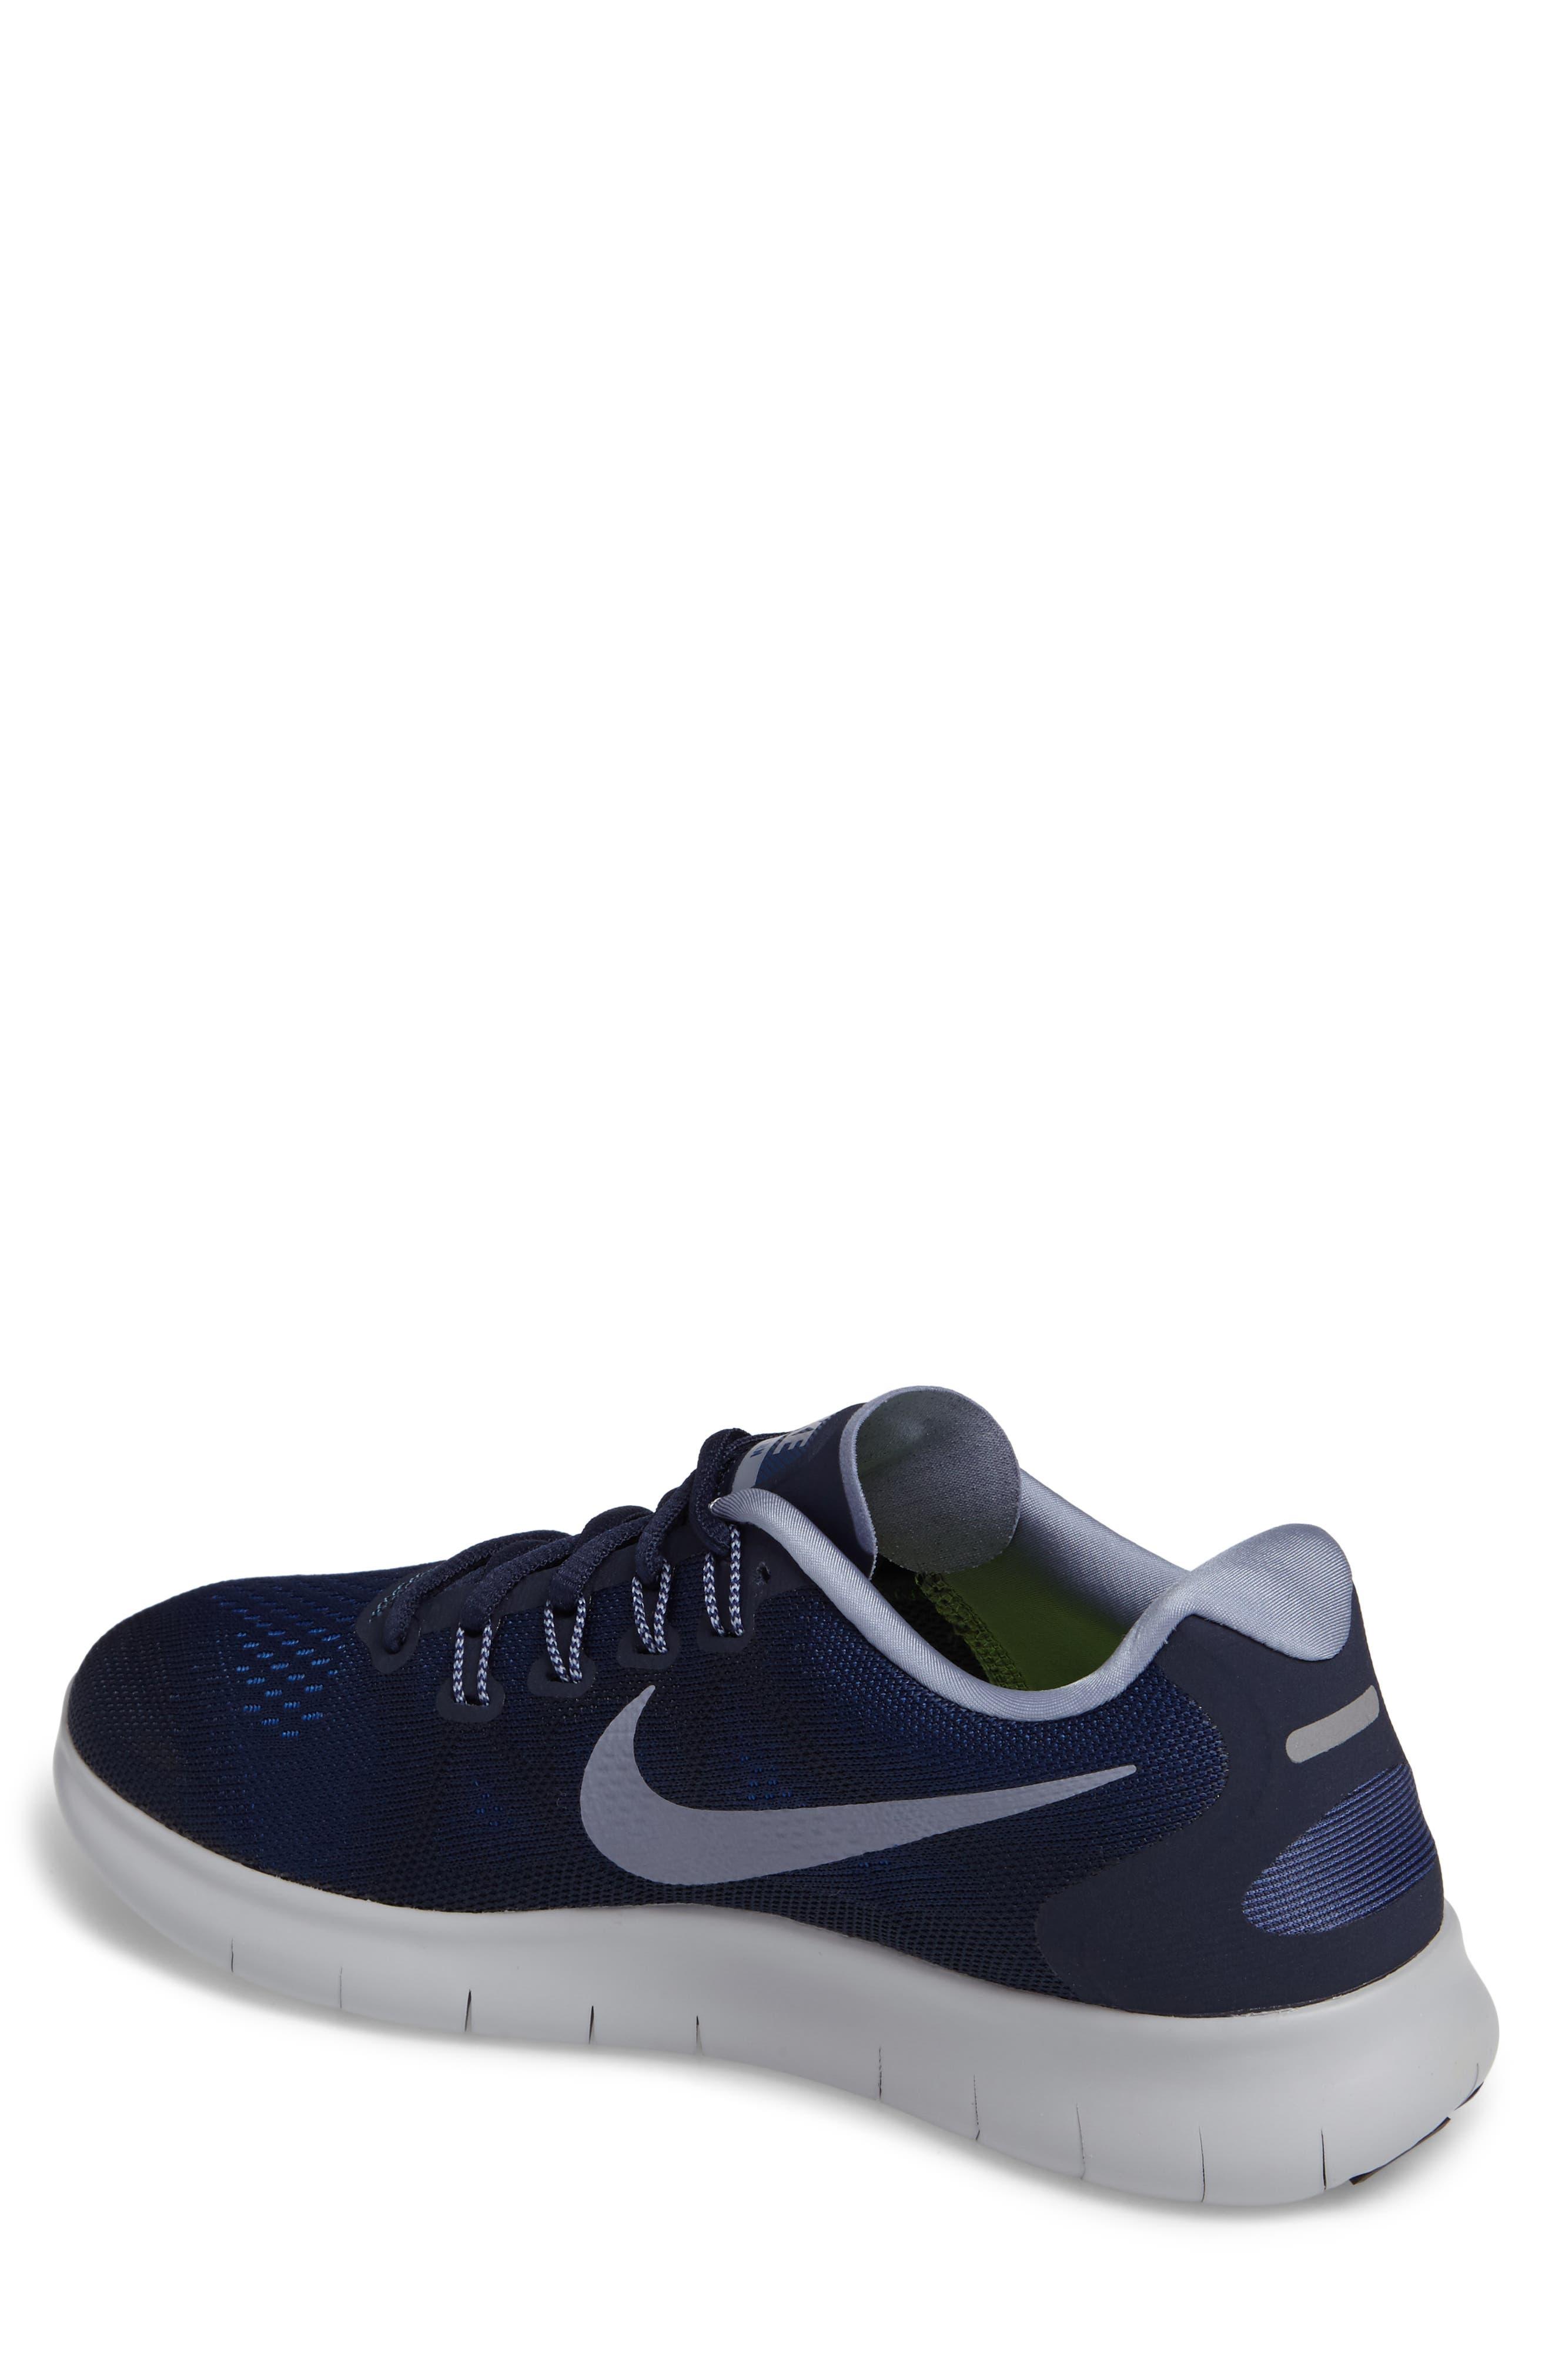 Free Run 2017 Running Shoe,                             Alternate thumbnail 24, color,